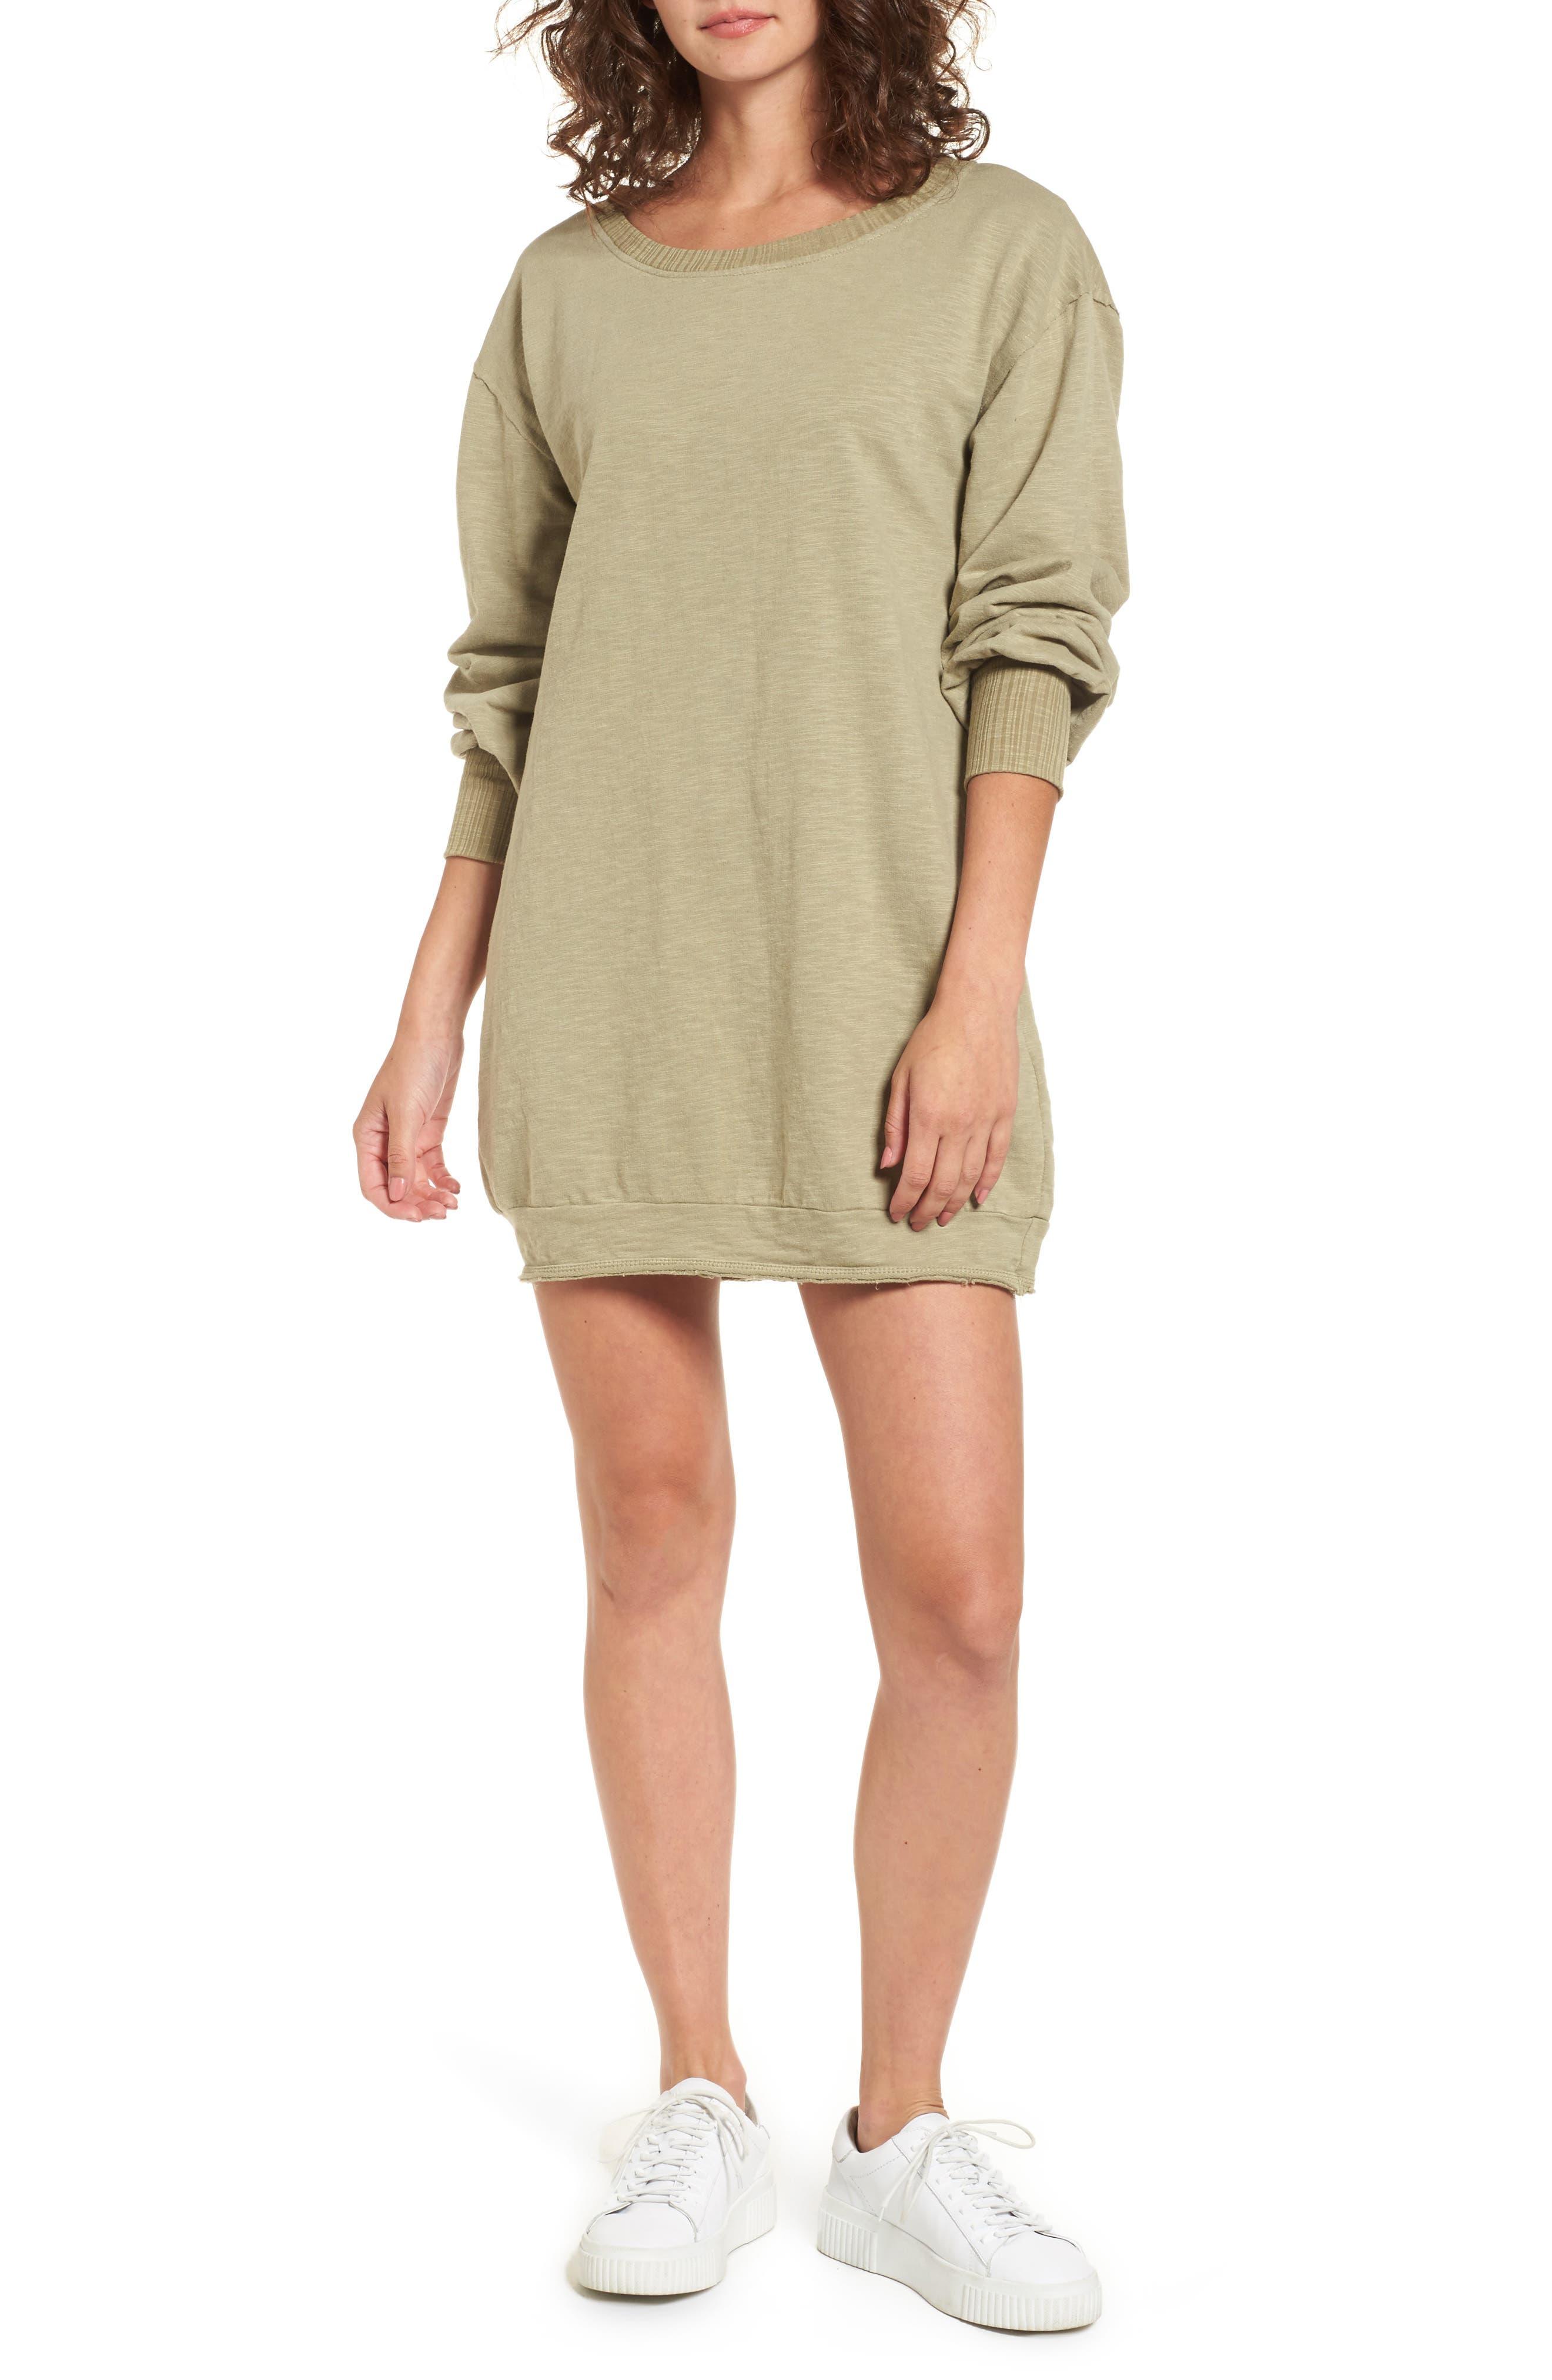 Main Image - Somedays Lovin Mountains Fade Sweatshirt Dress